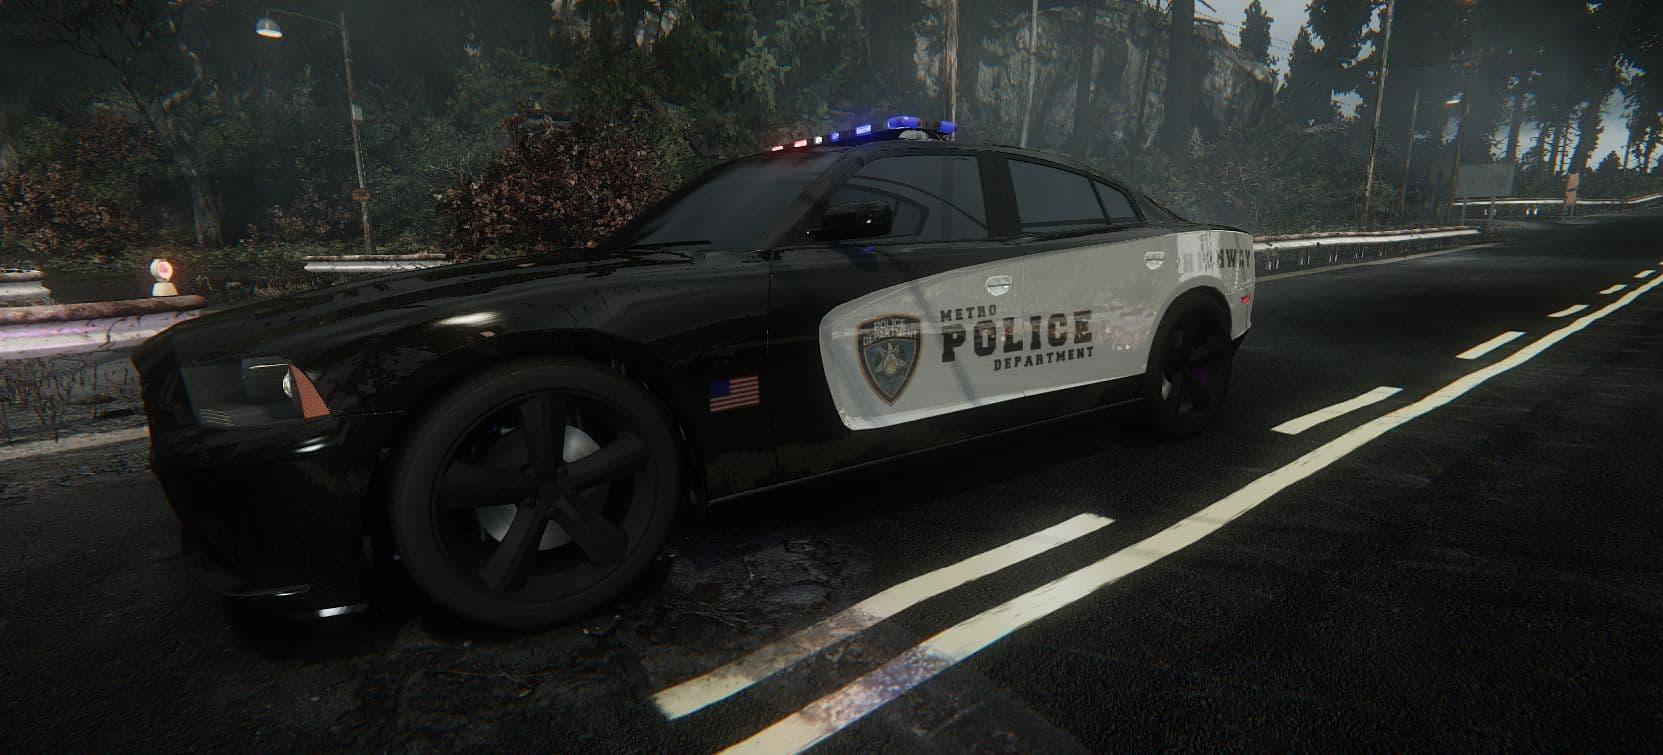 Police 10-13 Xbox One